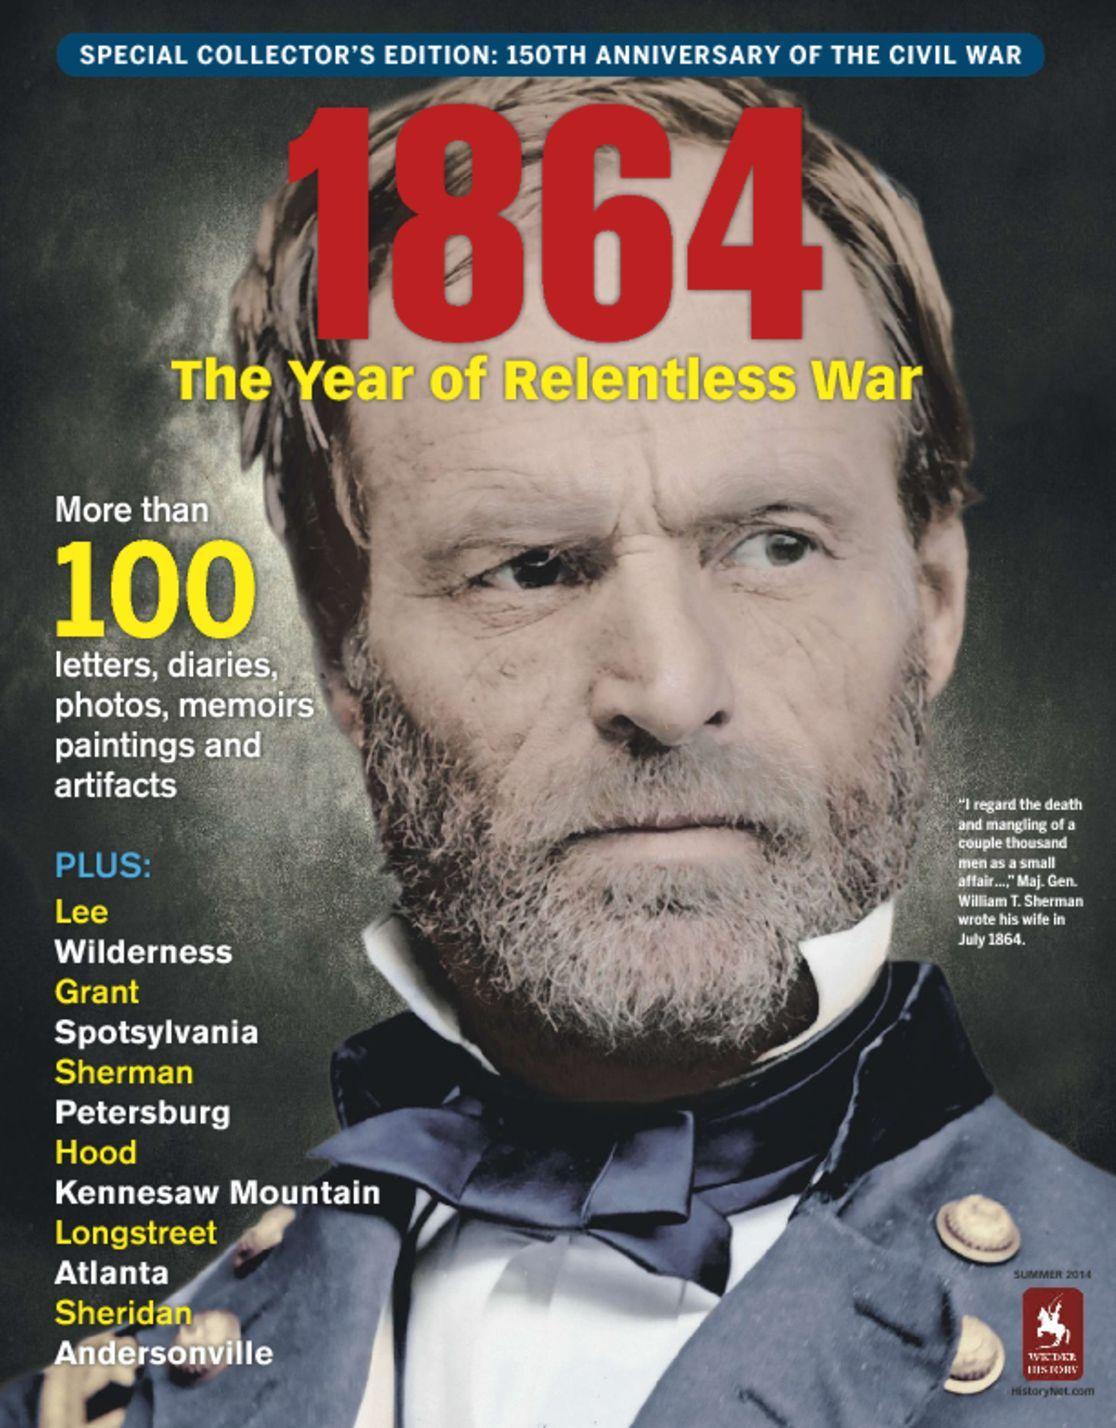 1864 Year of Relentless War Digital